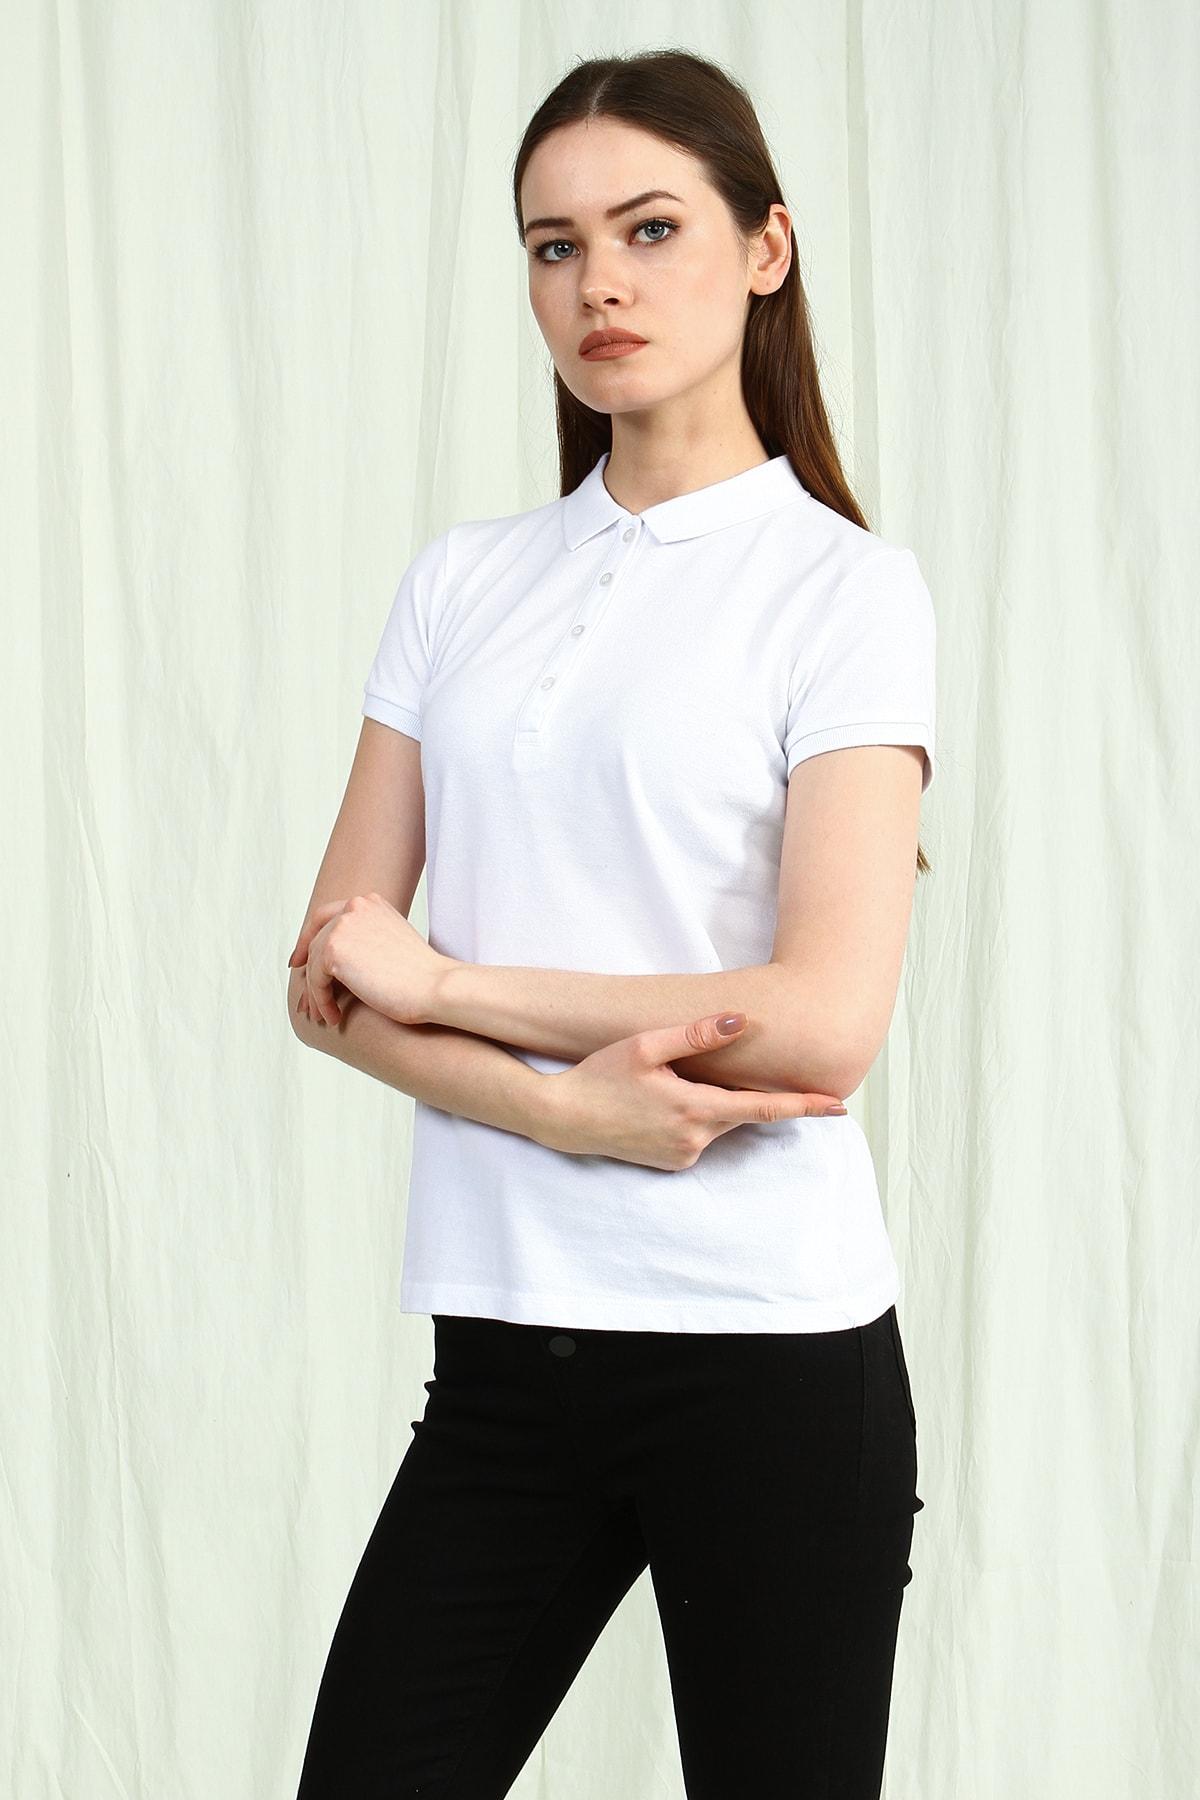 Collezione Beyaz Polo Yaka Kısa Kollu Basic Kadın Tshirt 2